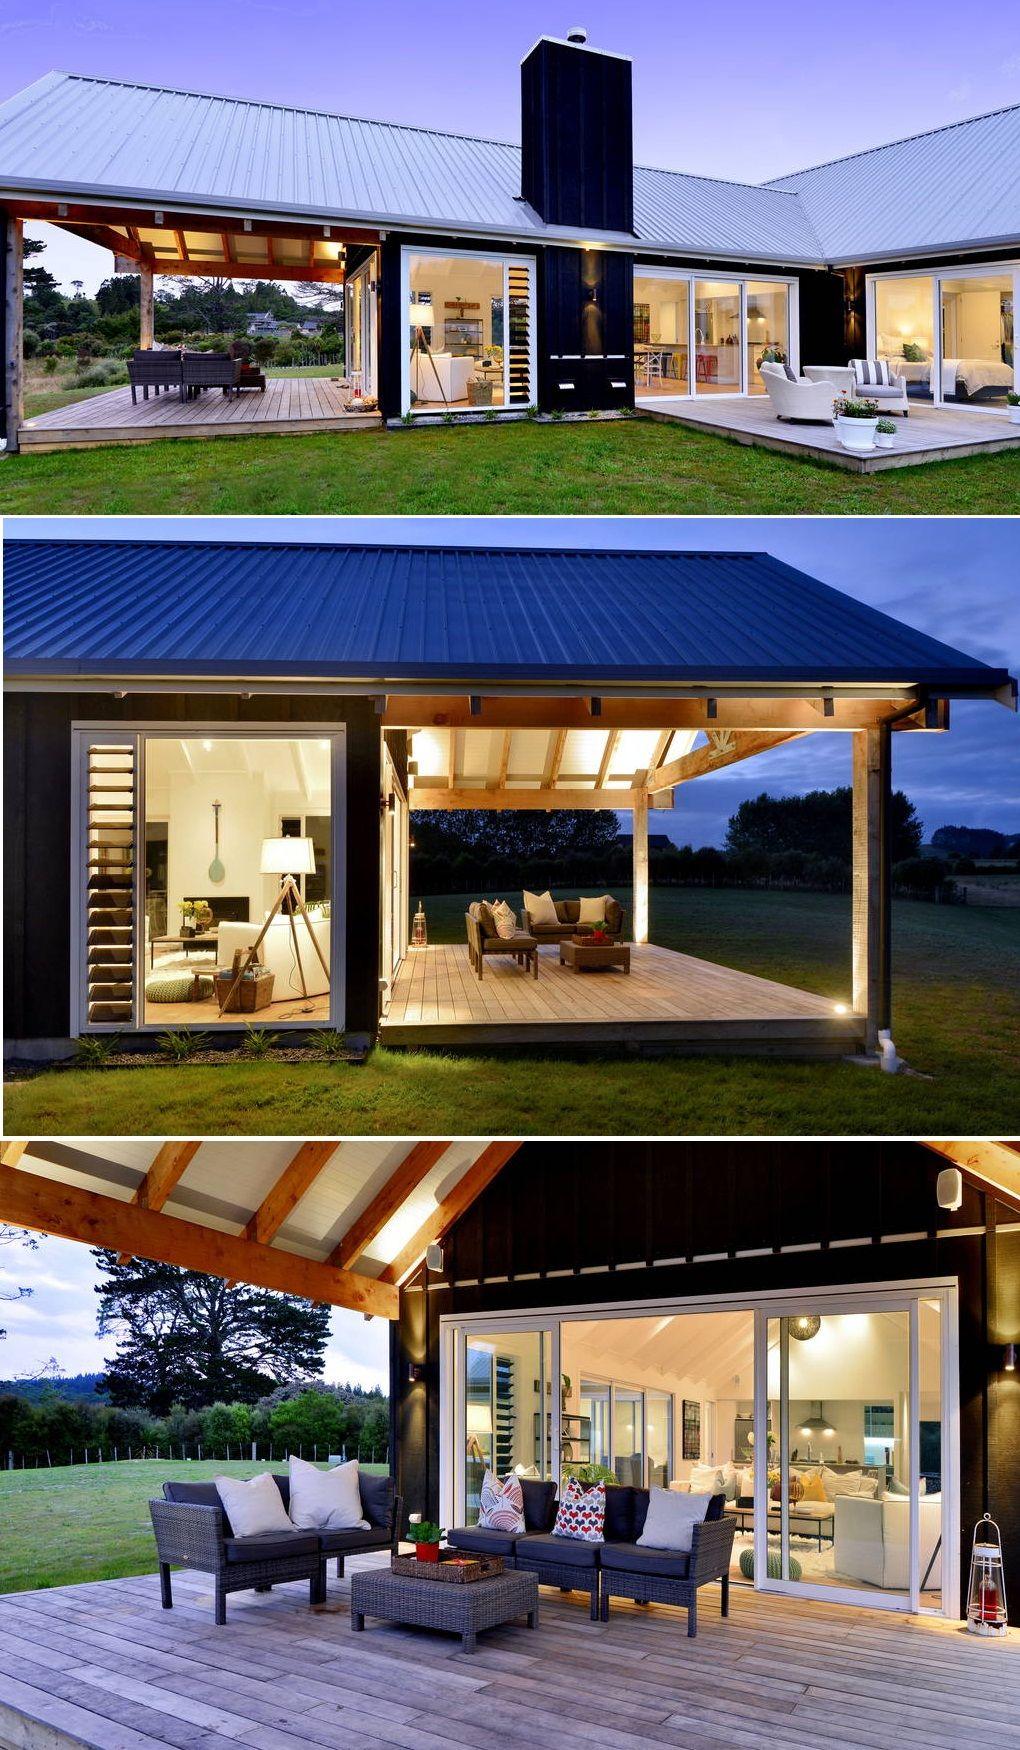 House plans  home designs also arquitetura future pinterest village houses farming and rh